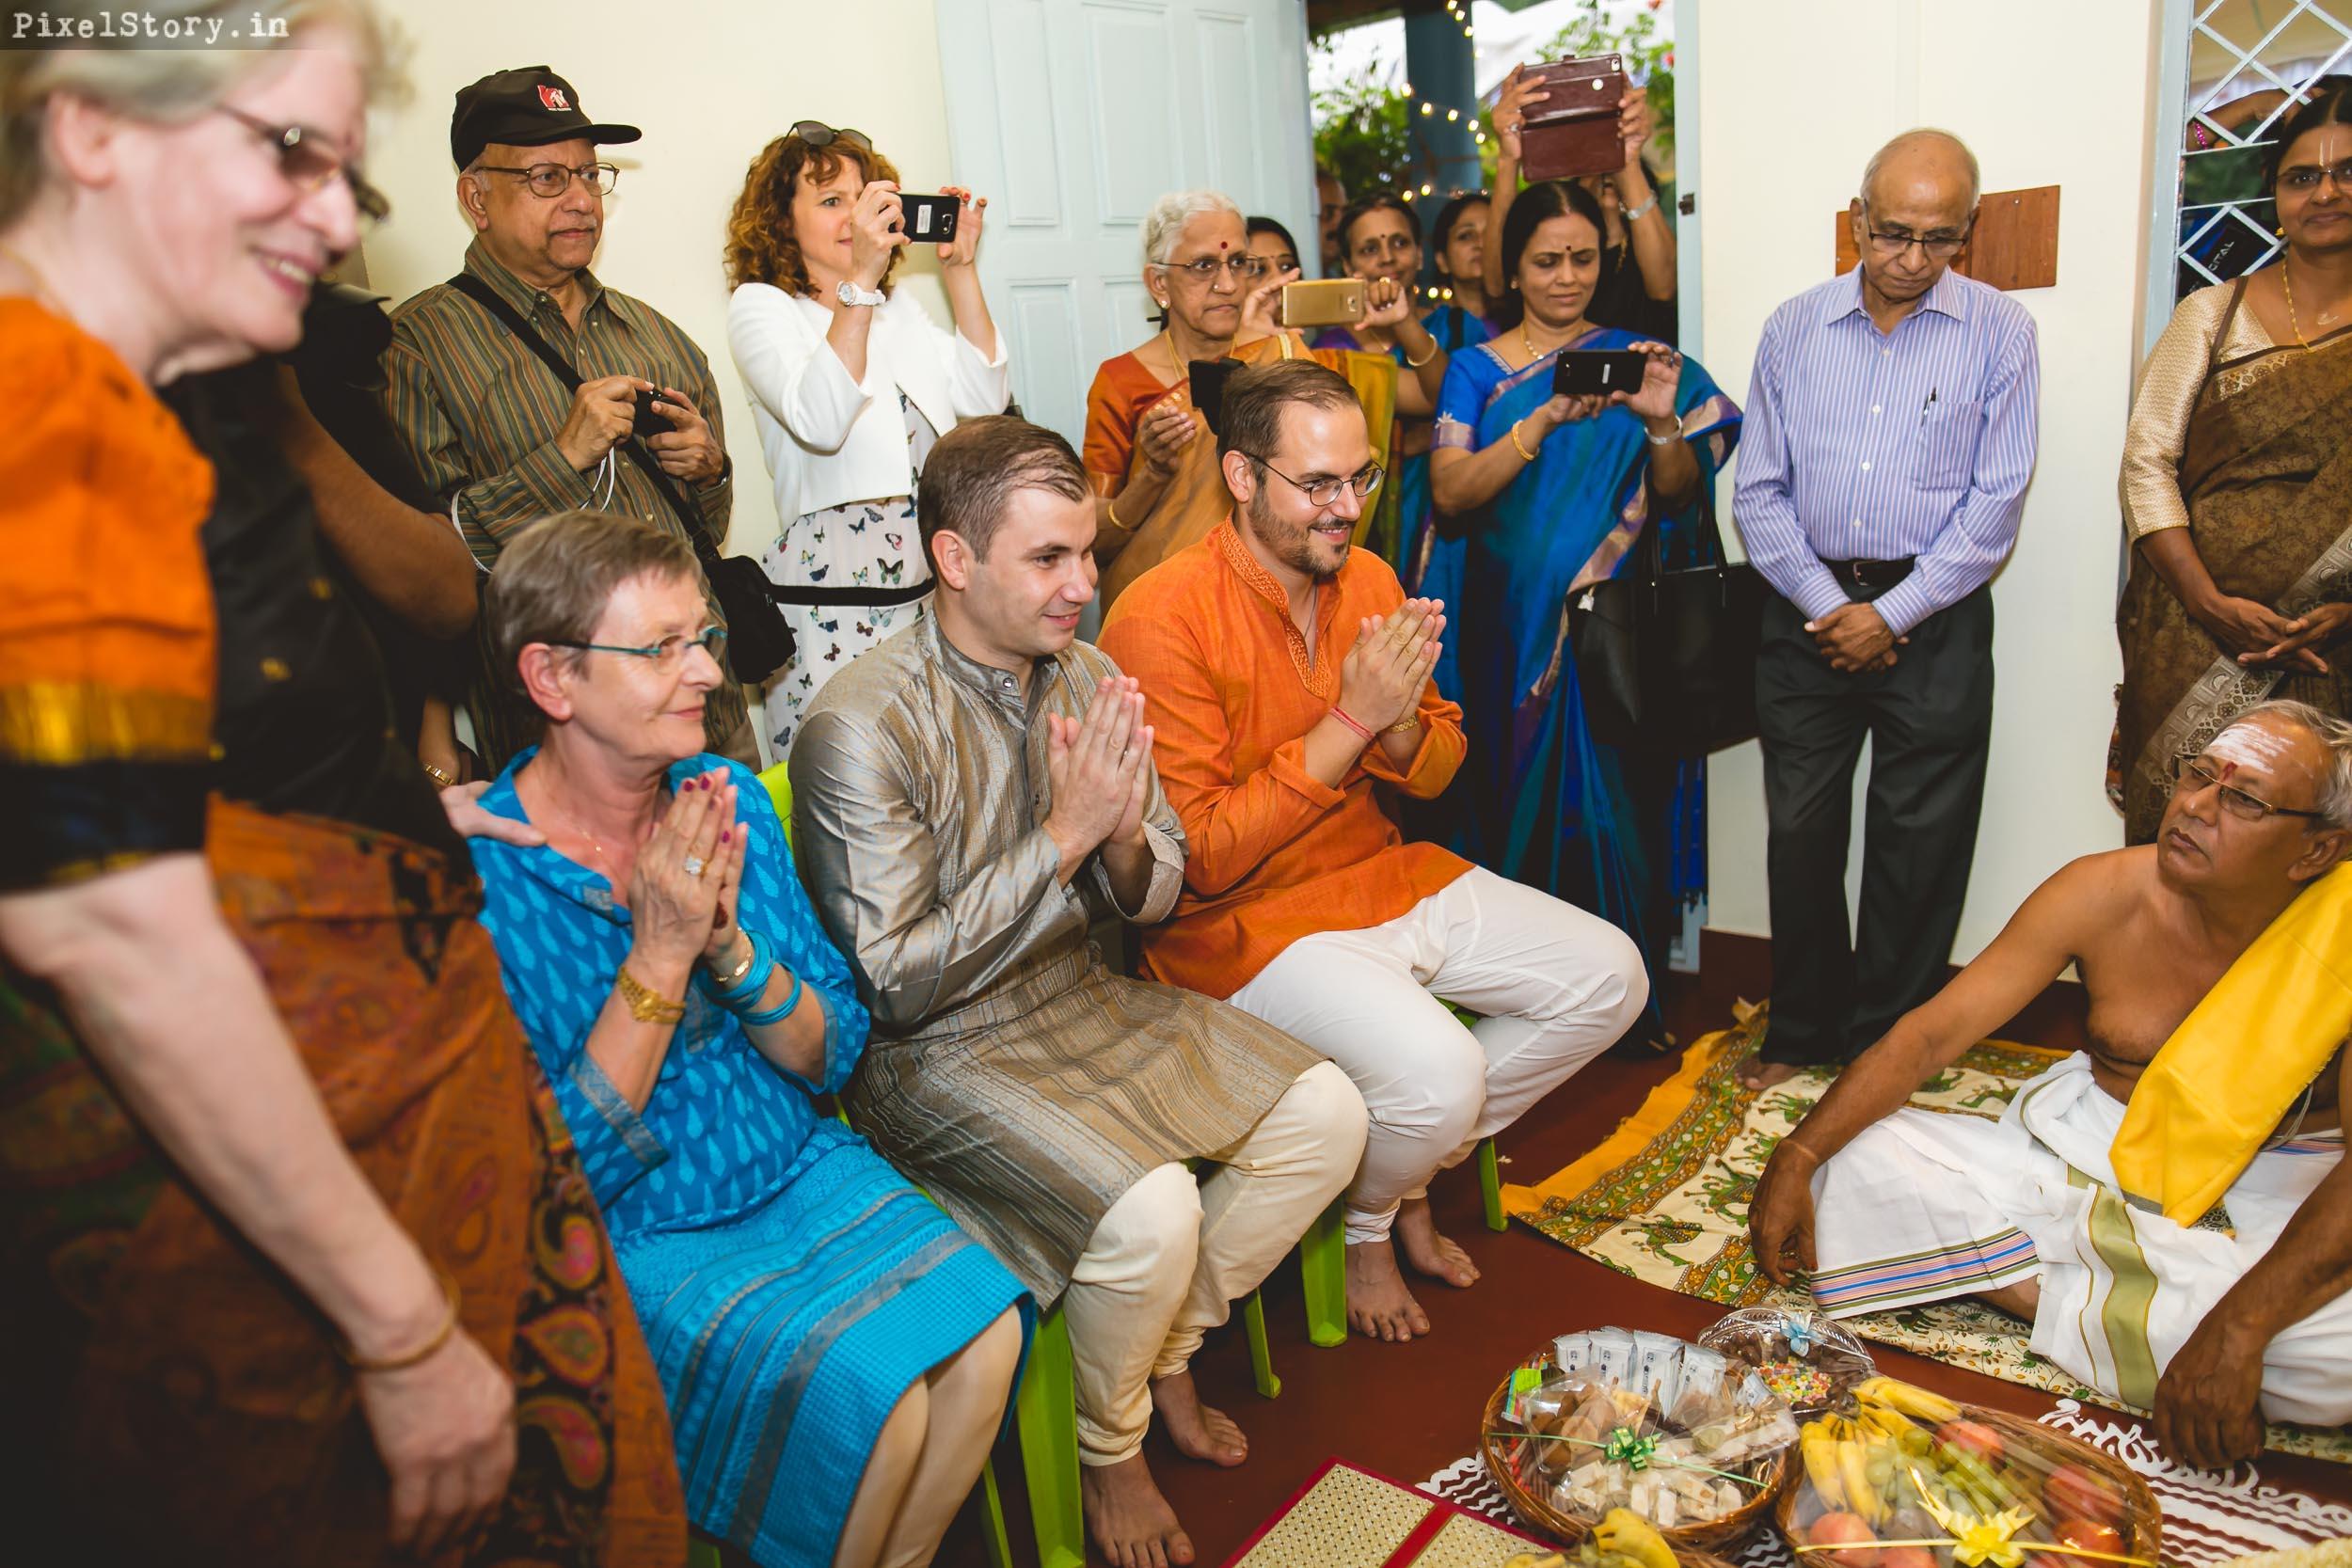 PixelStory-Jungle-Wedding-Photographer-Masinagudi-Indo-French005.jpg